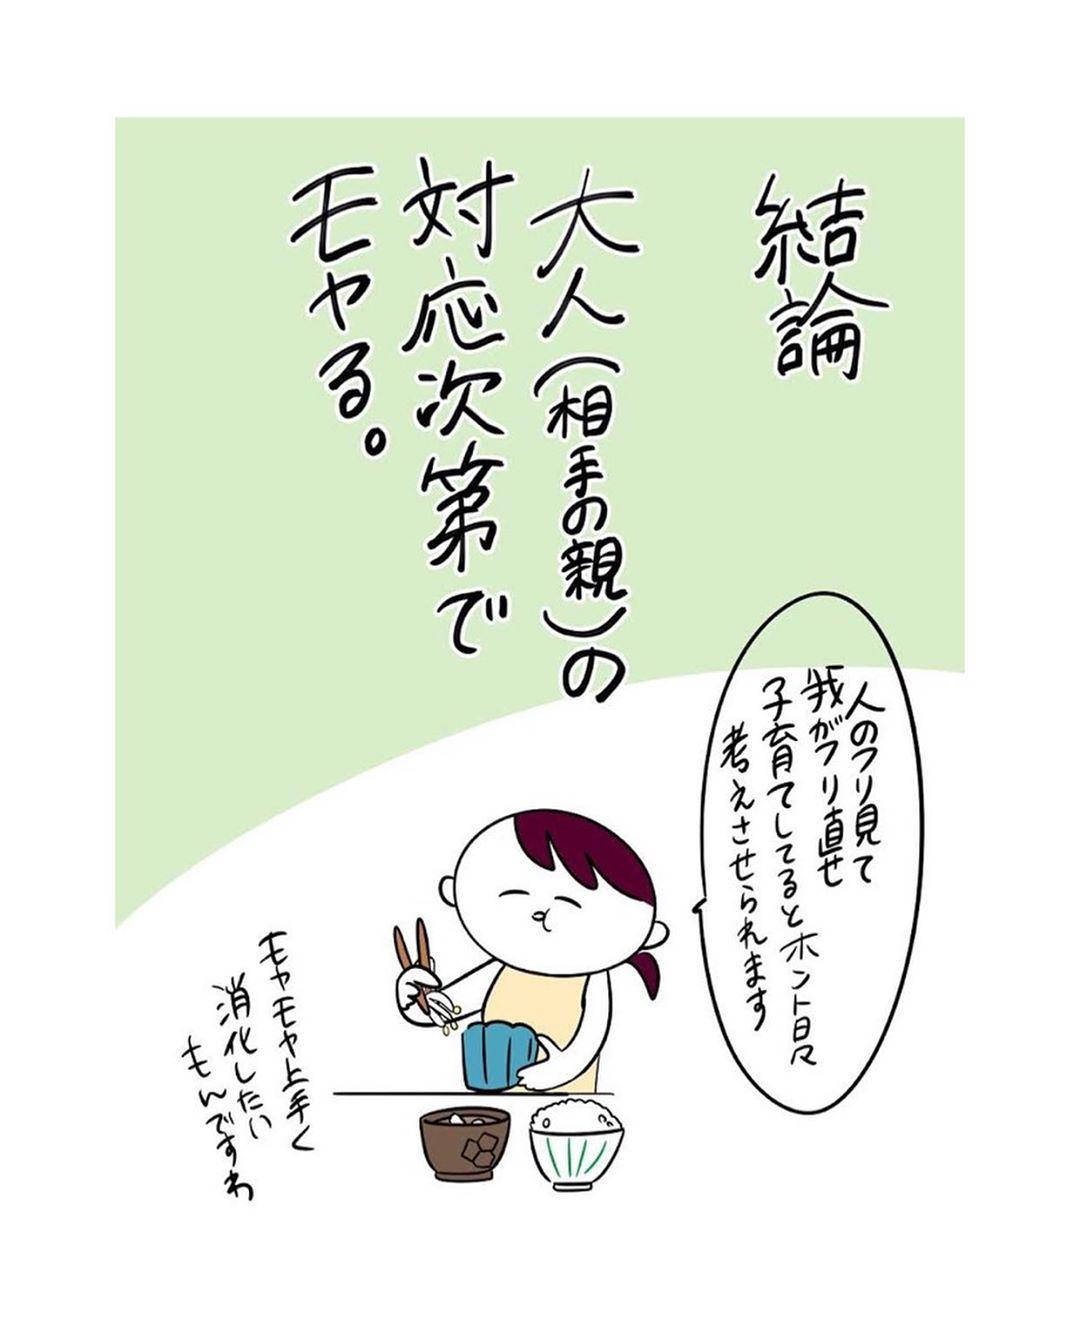 shirota.yunya_72981618_159039508649189_6043866684487072734_n